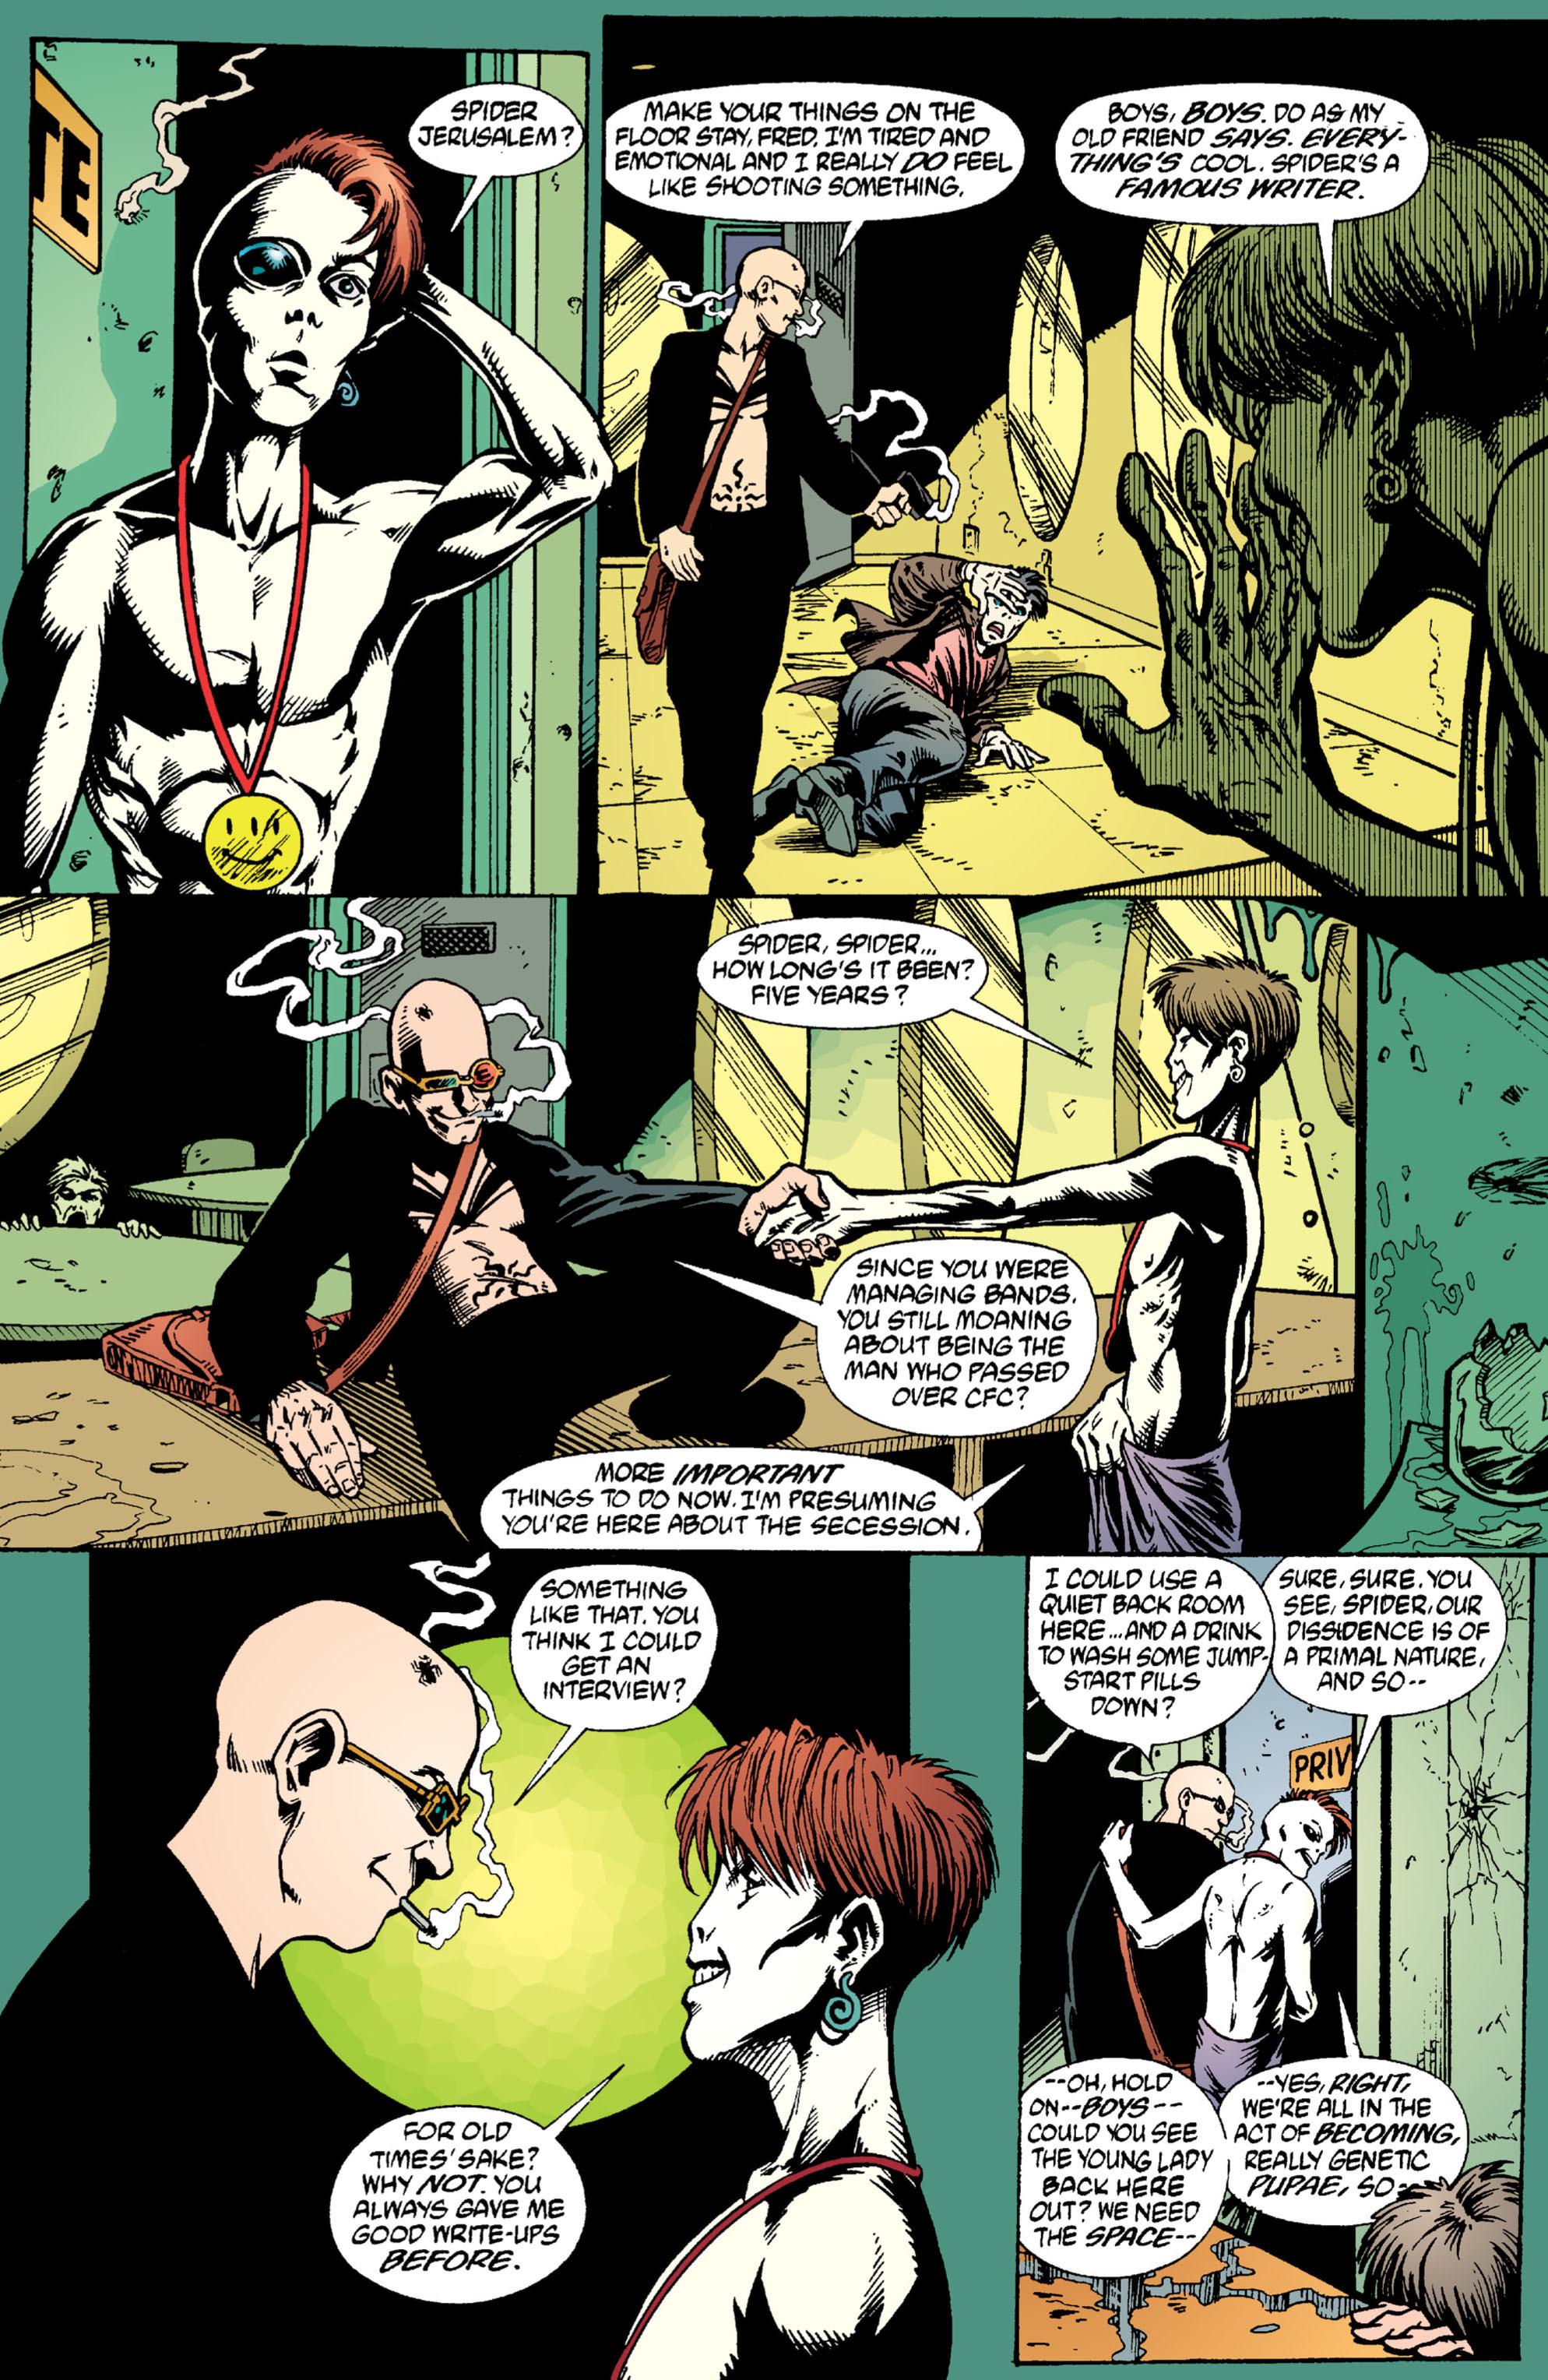 Read online Transmetropolitan comic -  Issue #2 - 11